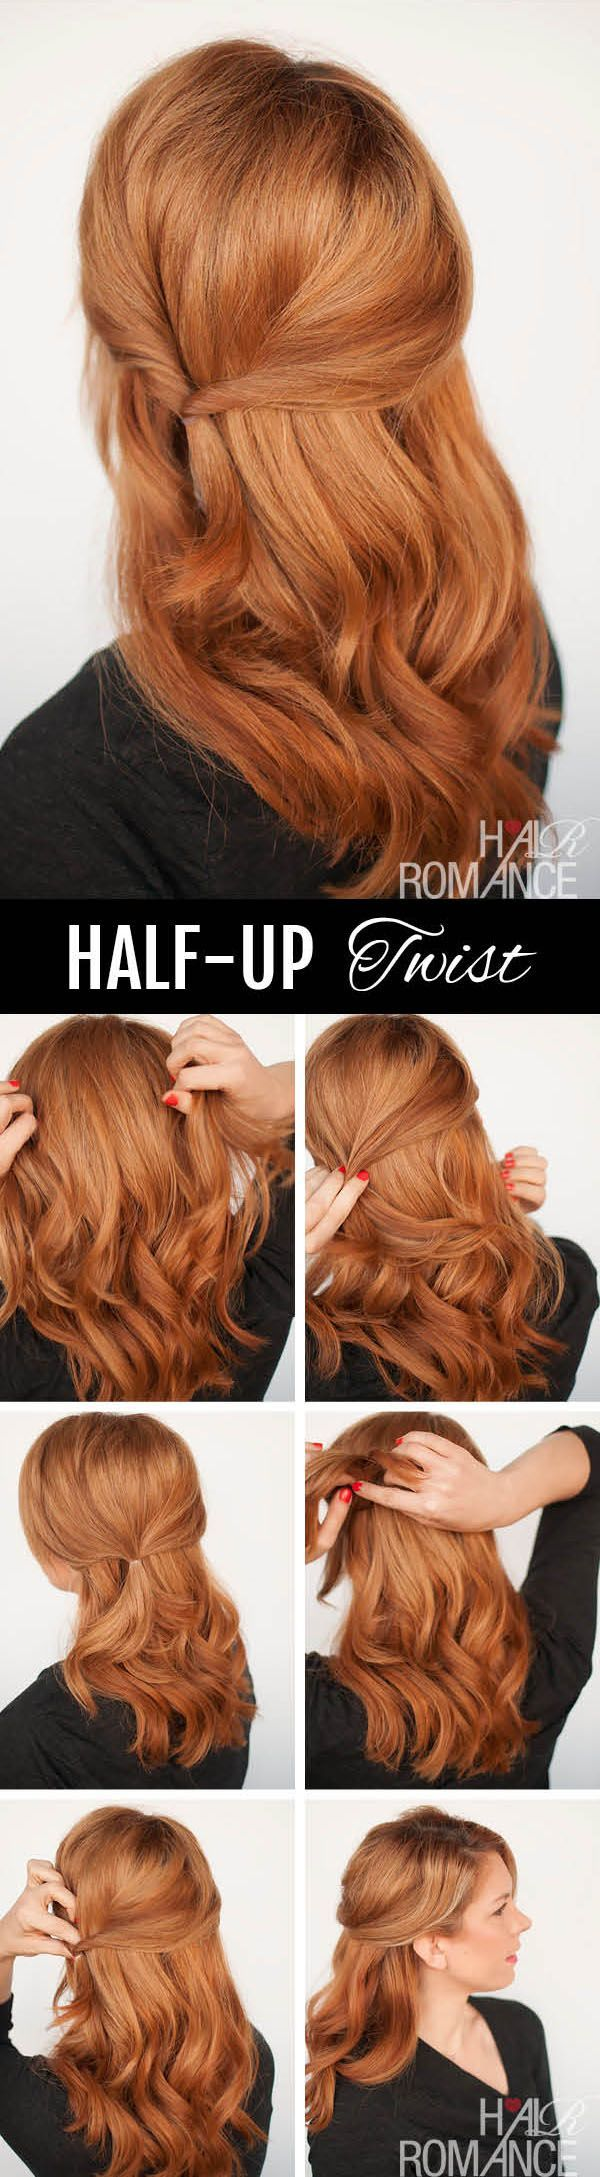 Half-up Twist Hairstyle Tutorial - Hair Romance #hairstyleideas